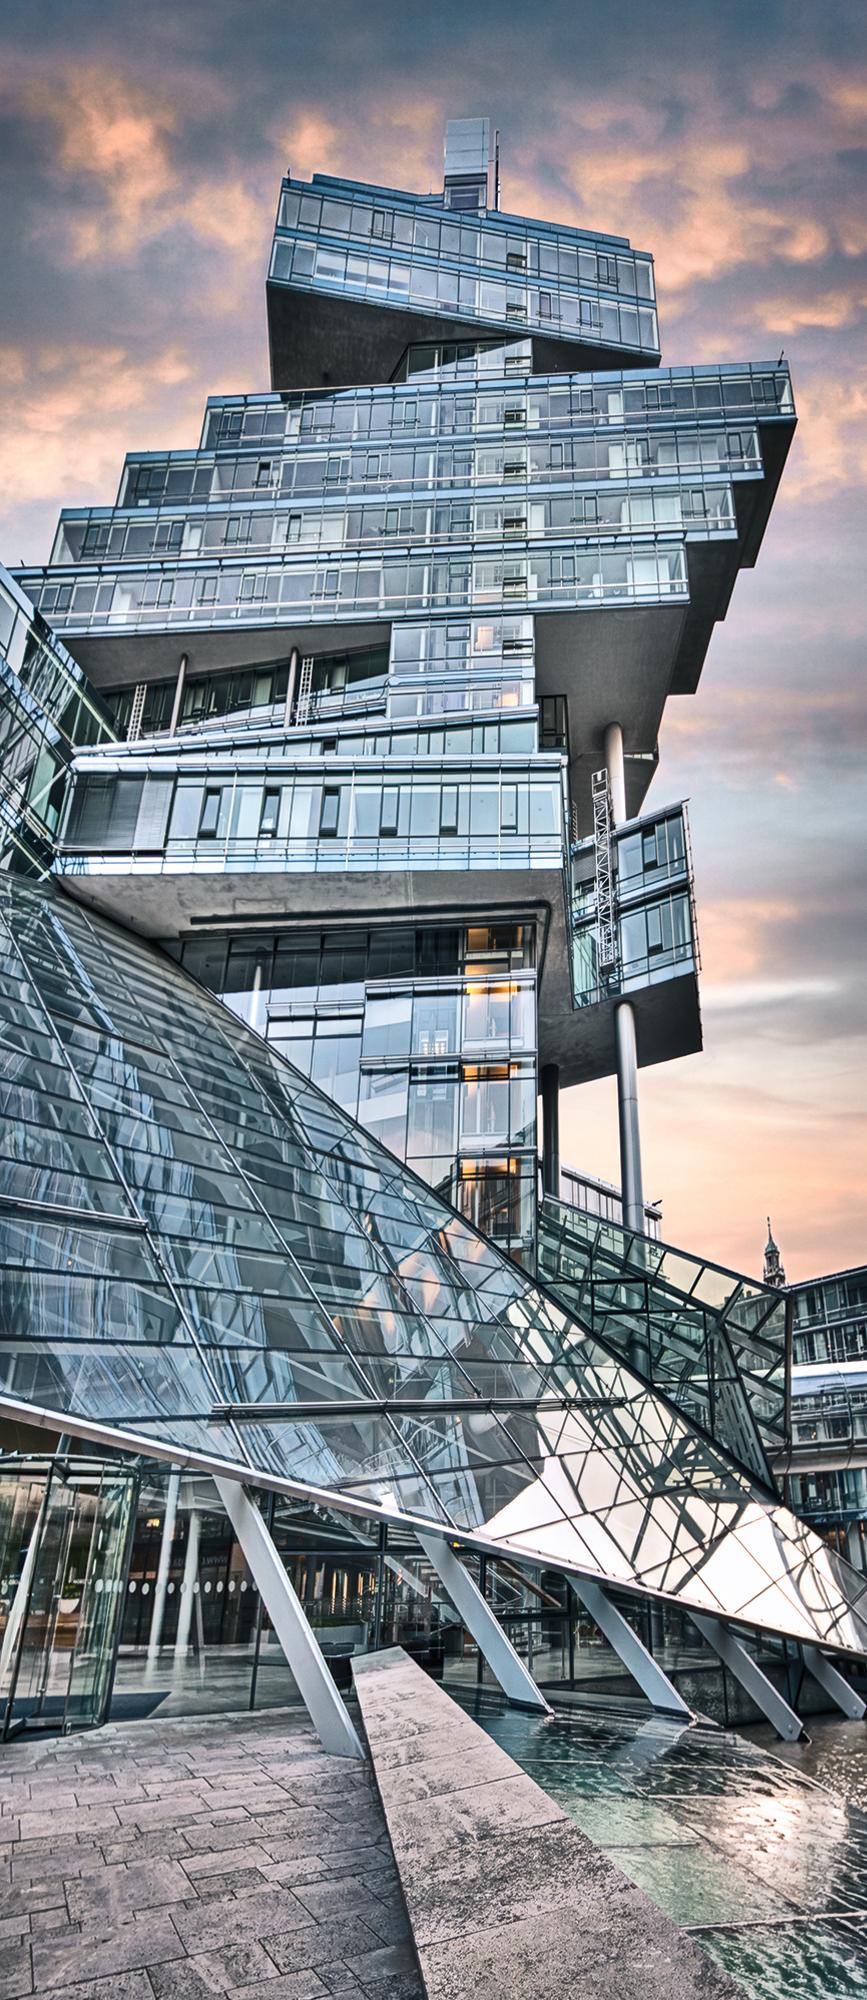 Landesbank I, 65 x 150 cm  ·  Leinwand auf Keilrahmen: € 660,- · Aludibond: € 810,- ·Acrylglas auf Aludibond: € 980,-  · © Stefan Korff